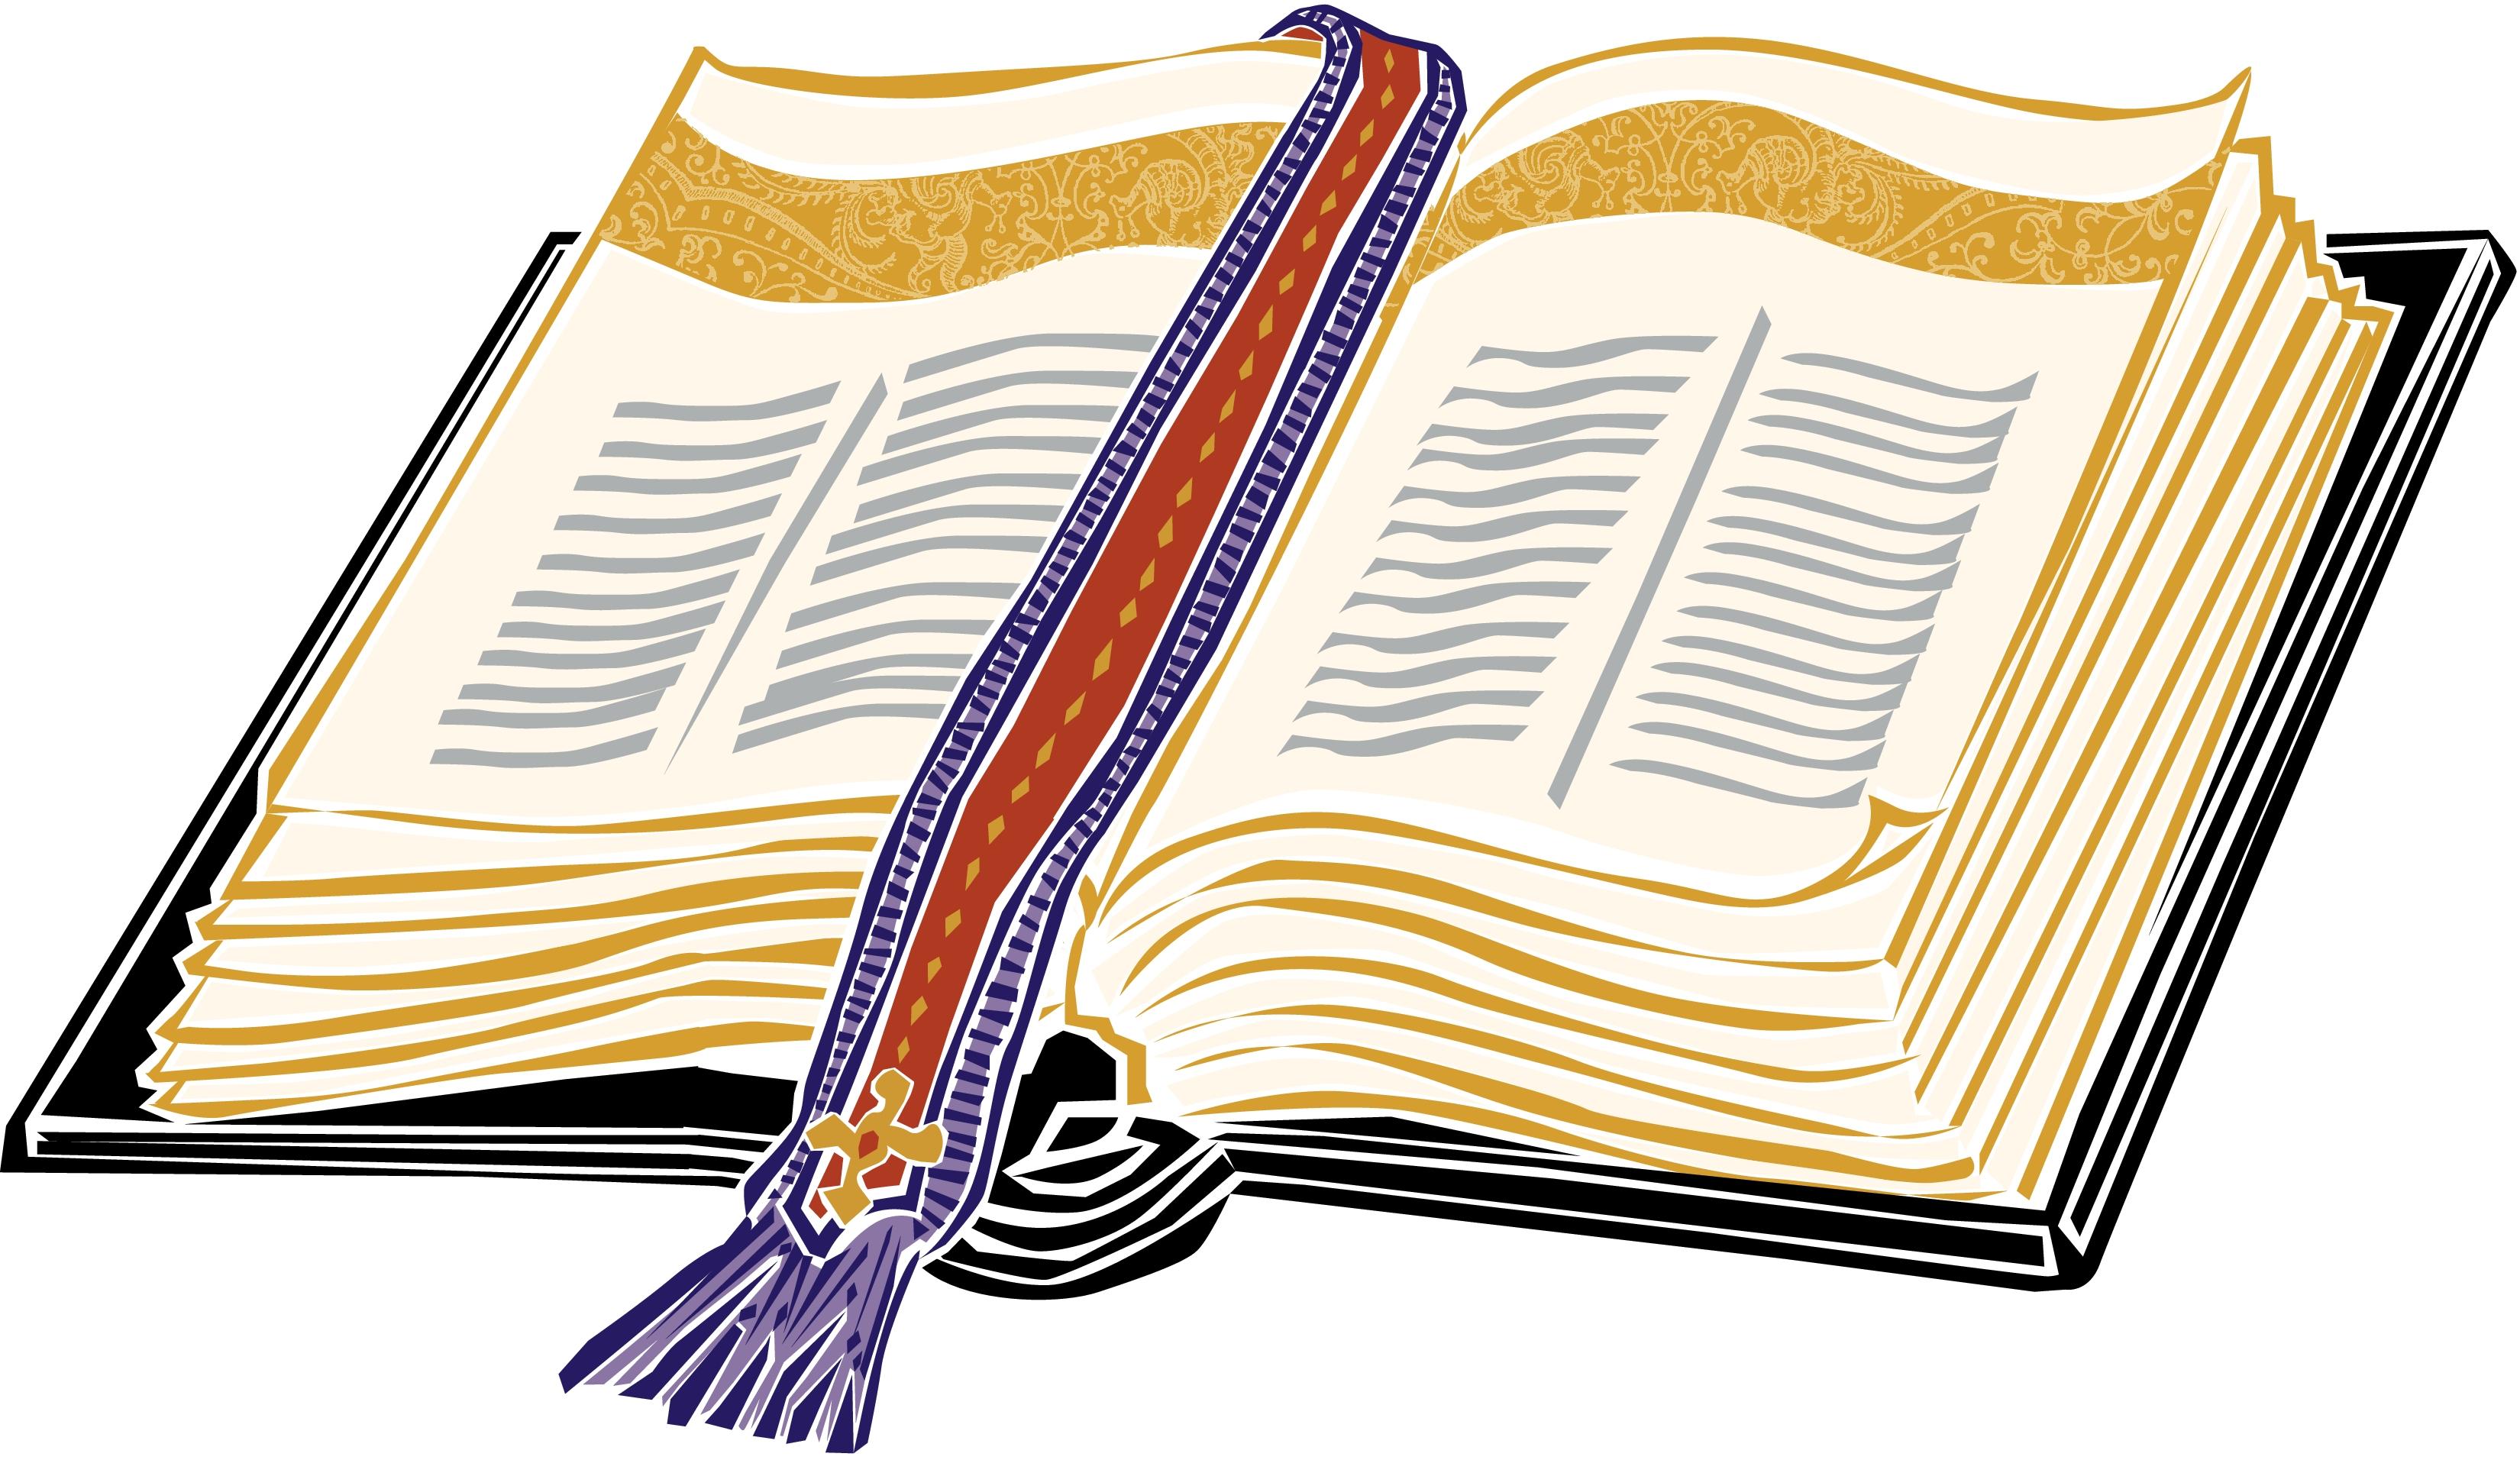 Scripture clipart #13, Download drawings